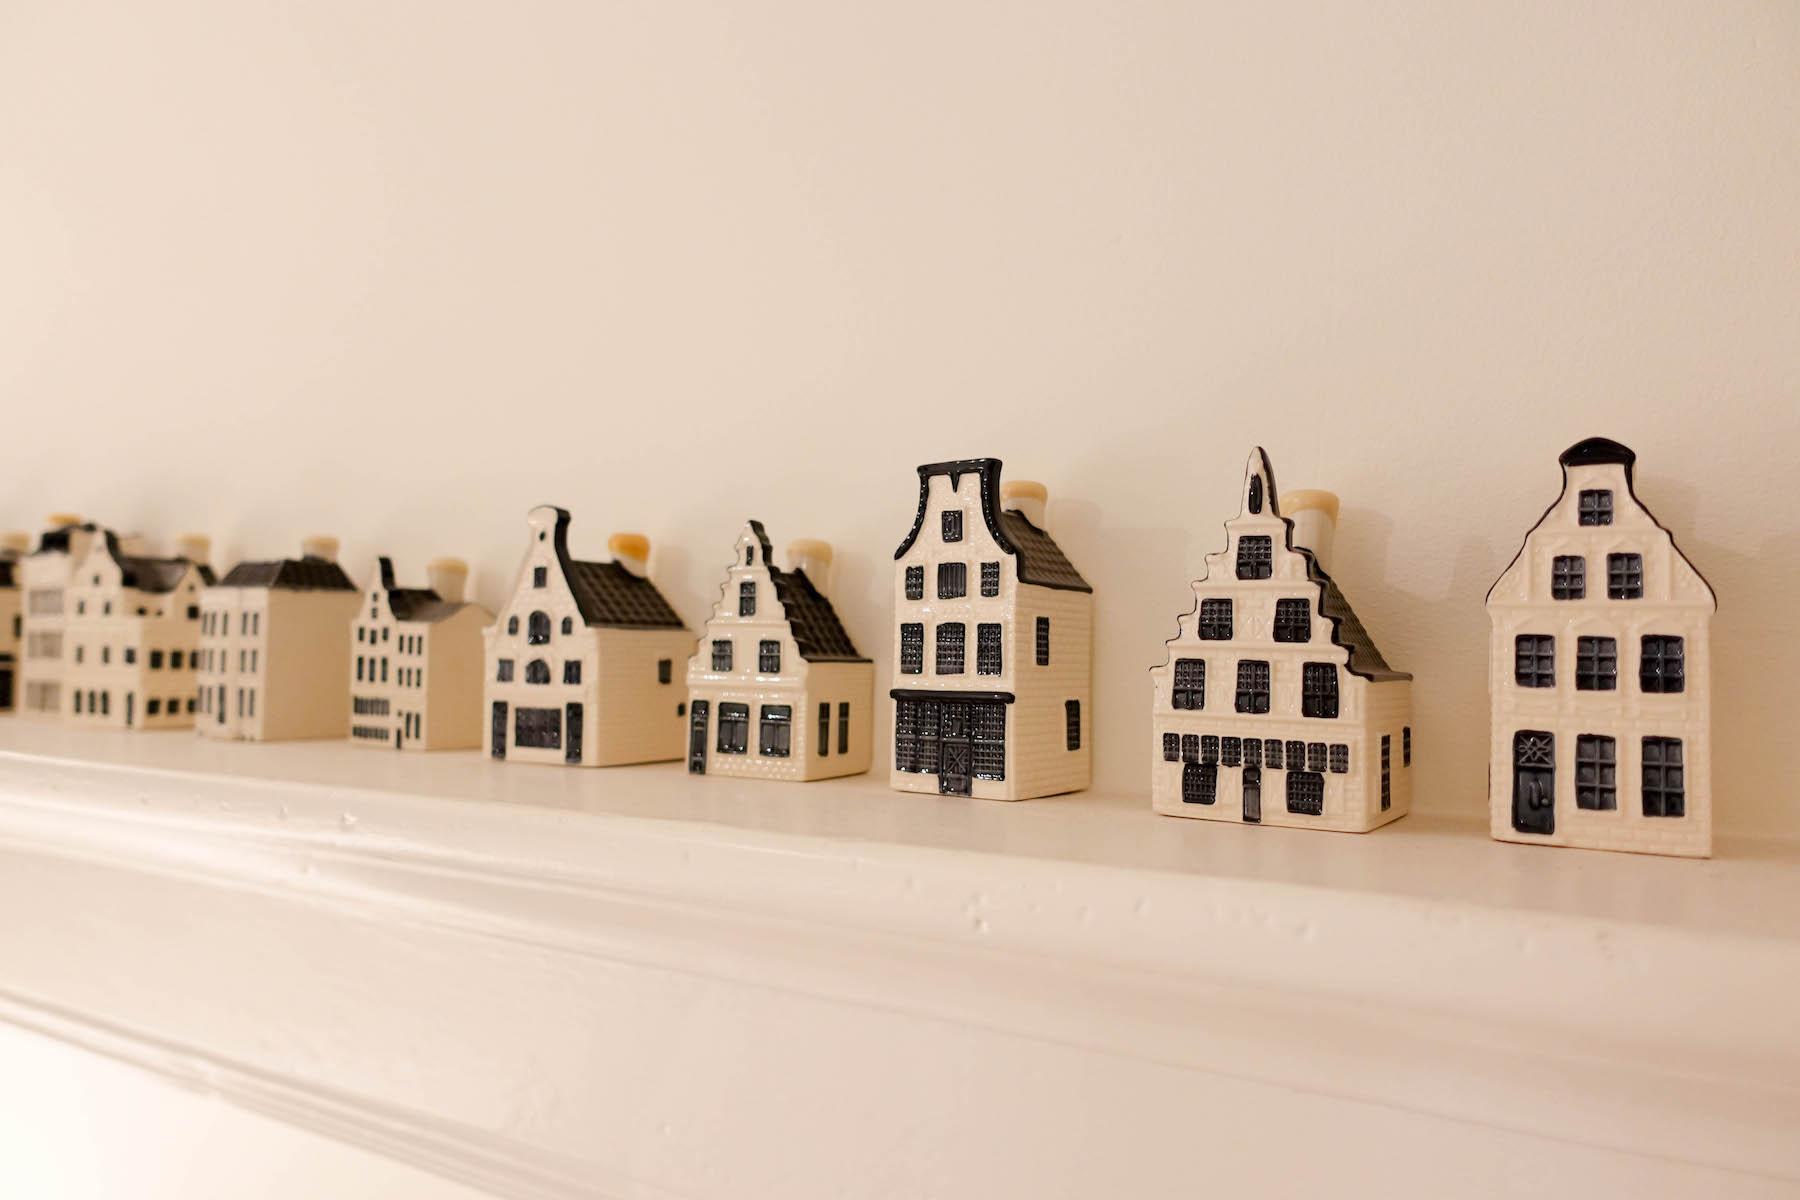 suelovesnyc_susan_fengler_amsterdam_airbnb_wohnung_in_amsterdam_detail